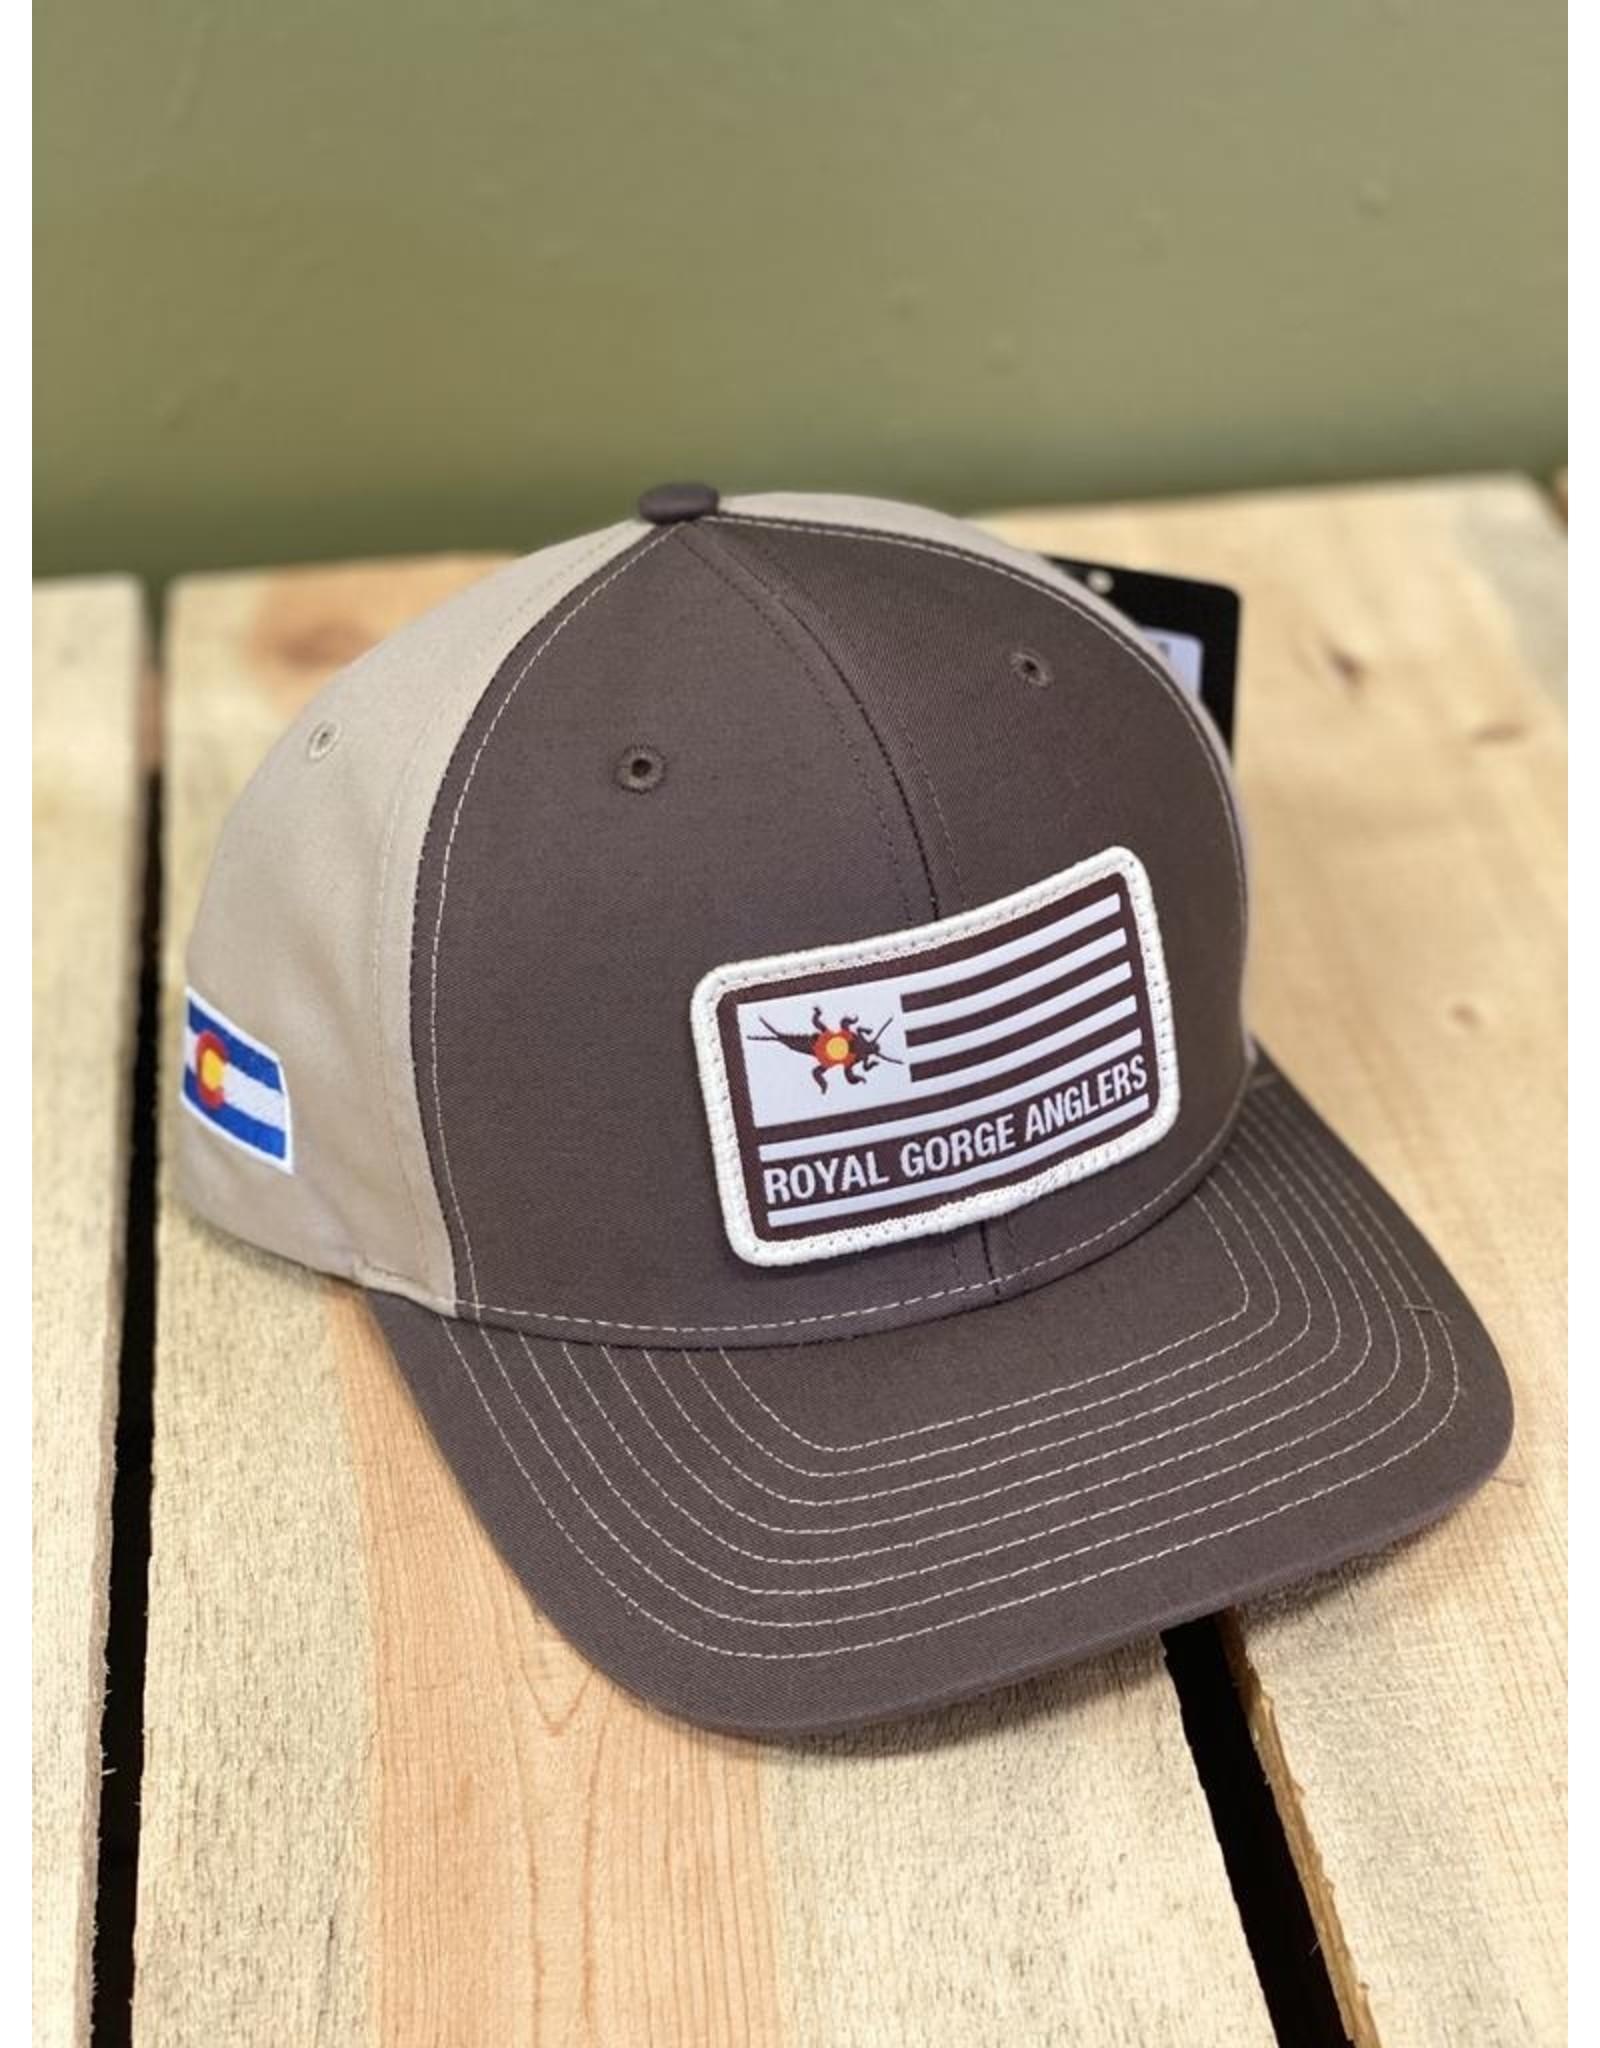 Stonebug Flag Patch Hat (Brown/Khaki)